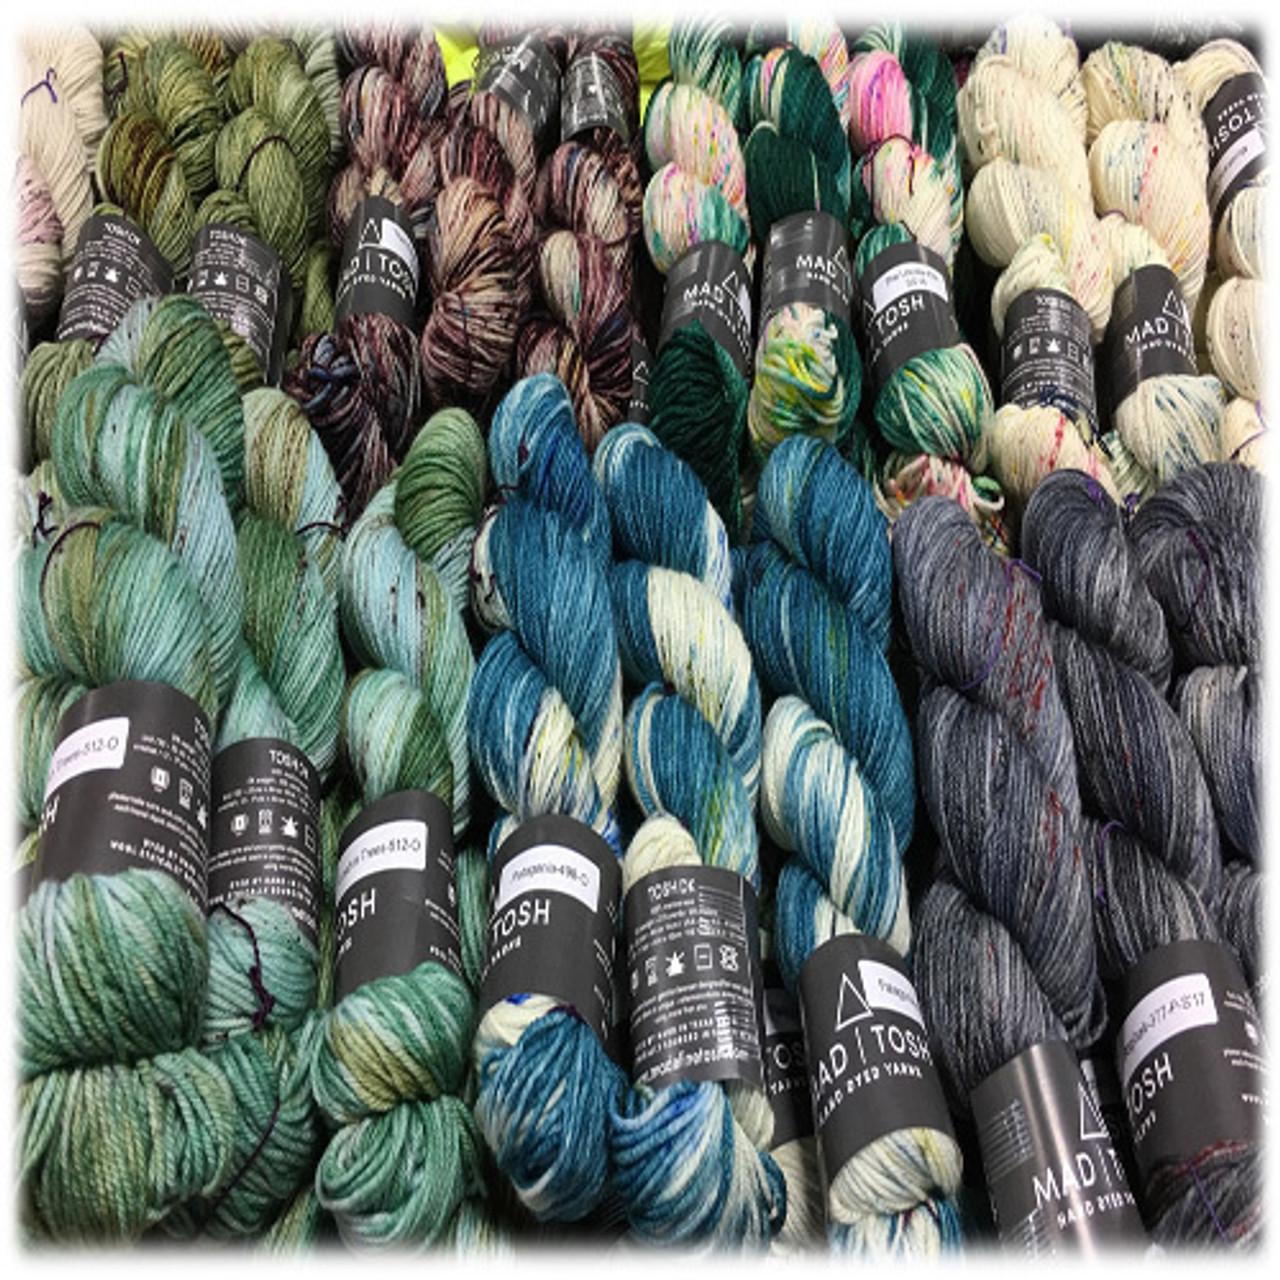 Madelinetosh - Tosh DK - Hand-dyed 100% Merino Yarn